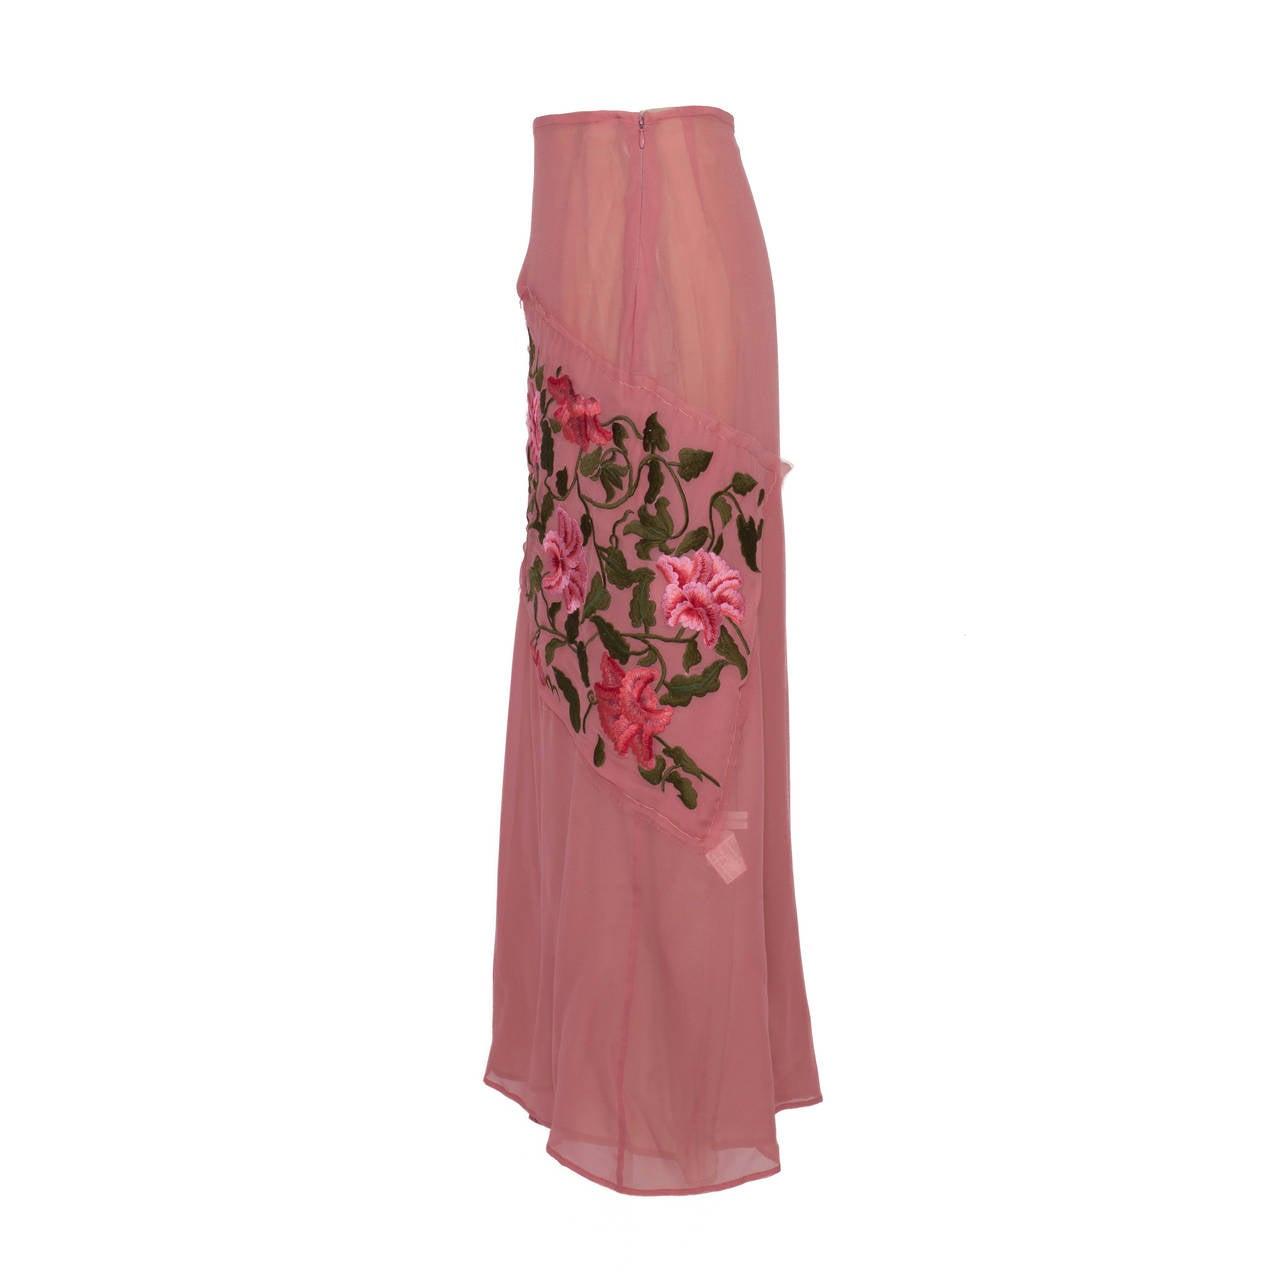 Women's Yohji Yamamoto + Noir Pink Skirt Flower Embroidery For Sale